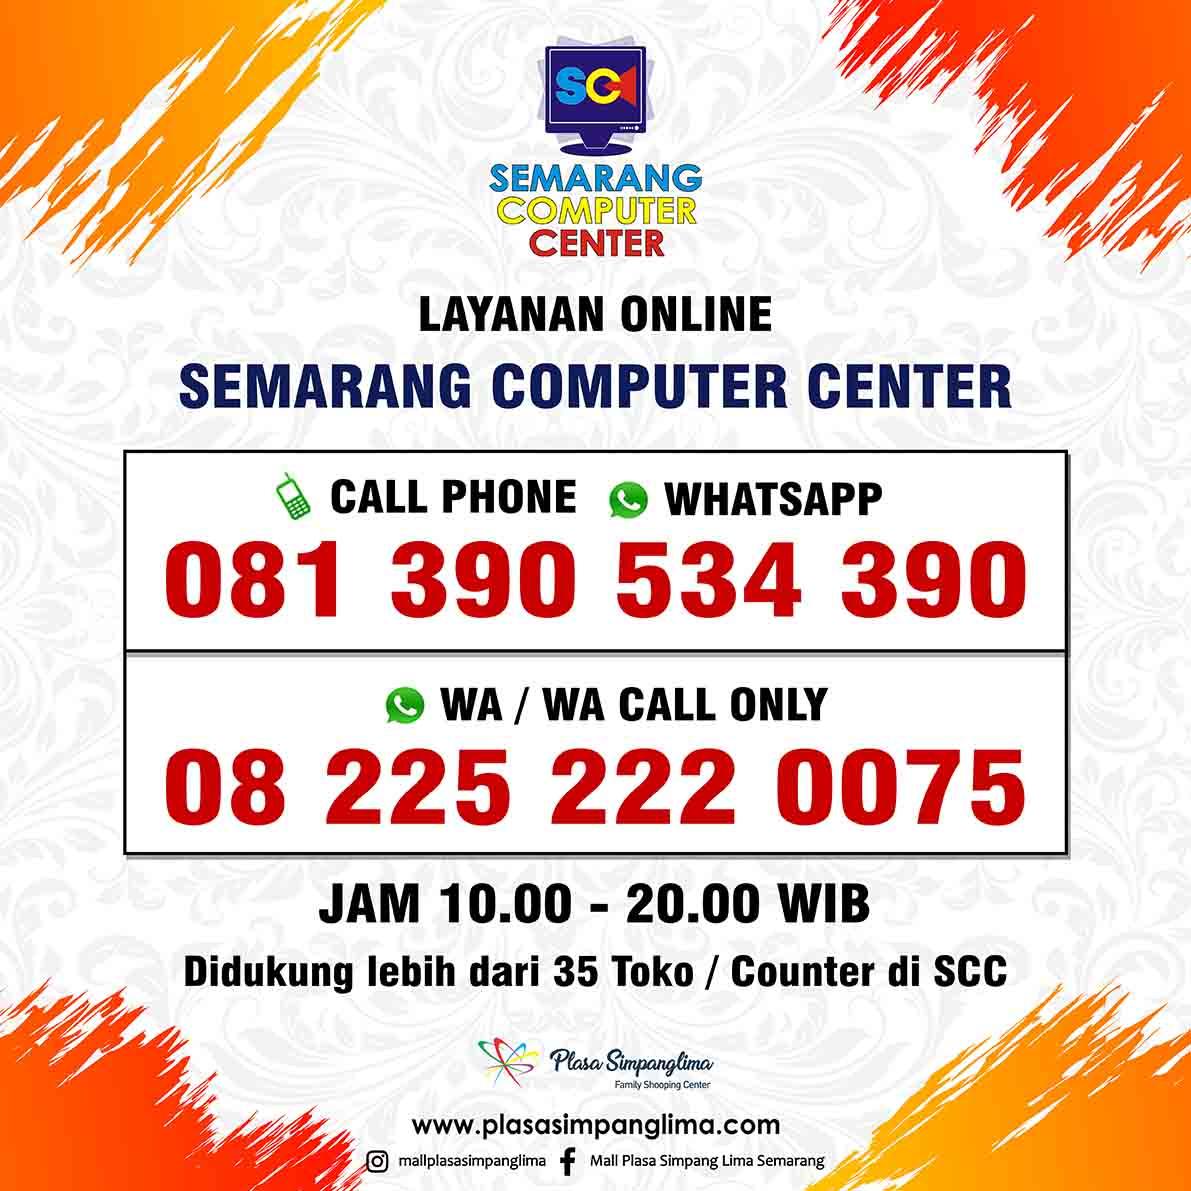 Layanan Online Semarang Computer Center